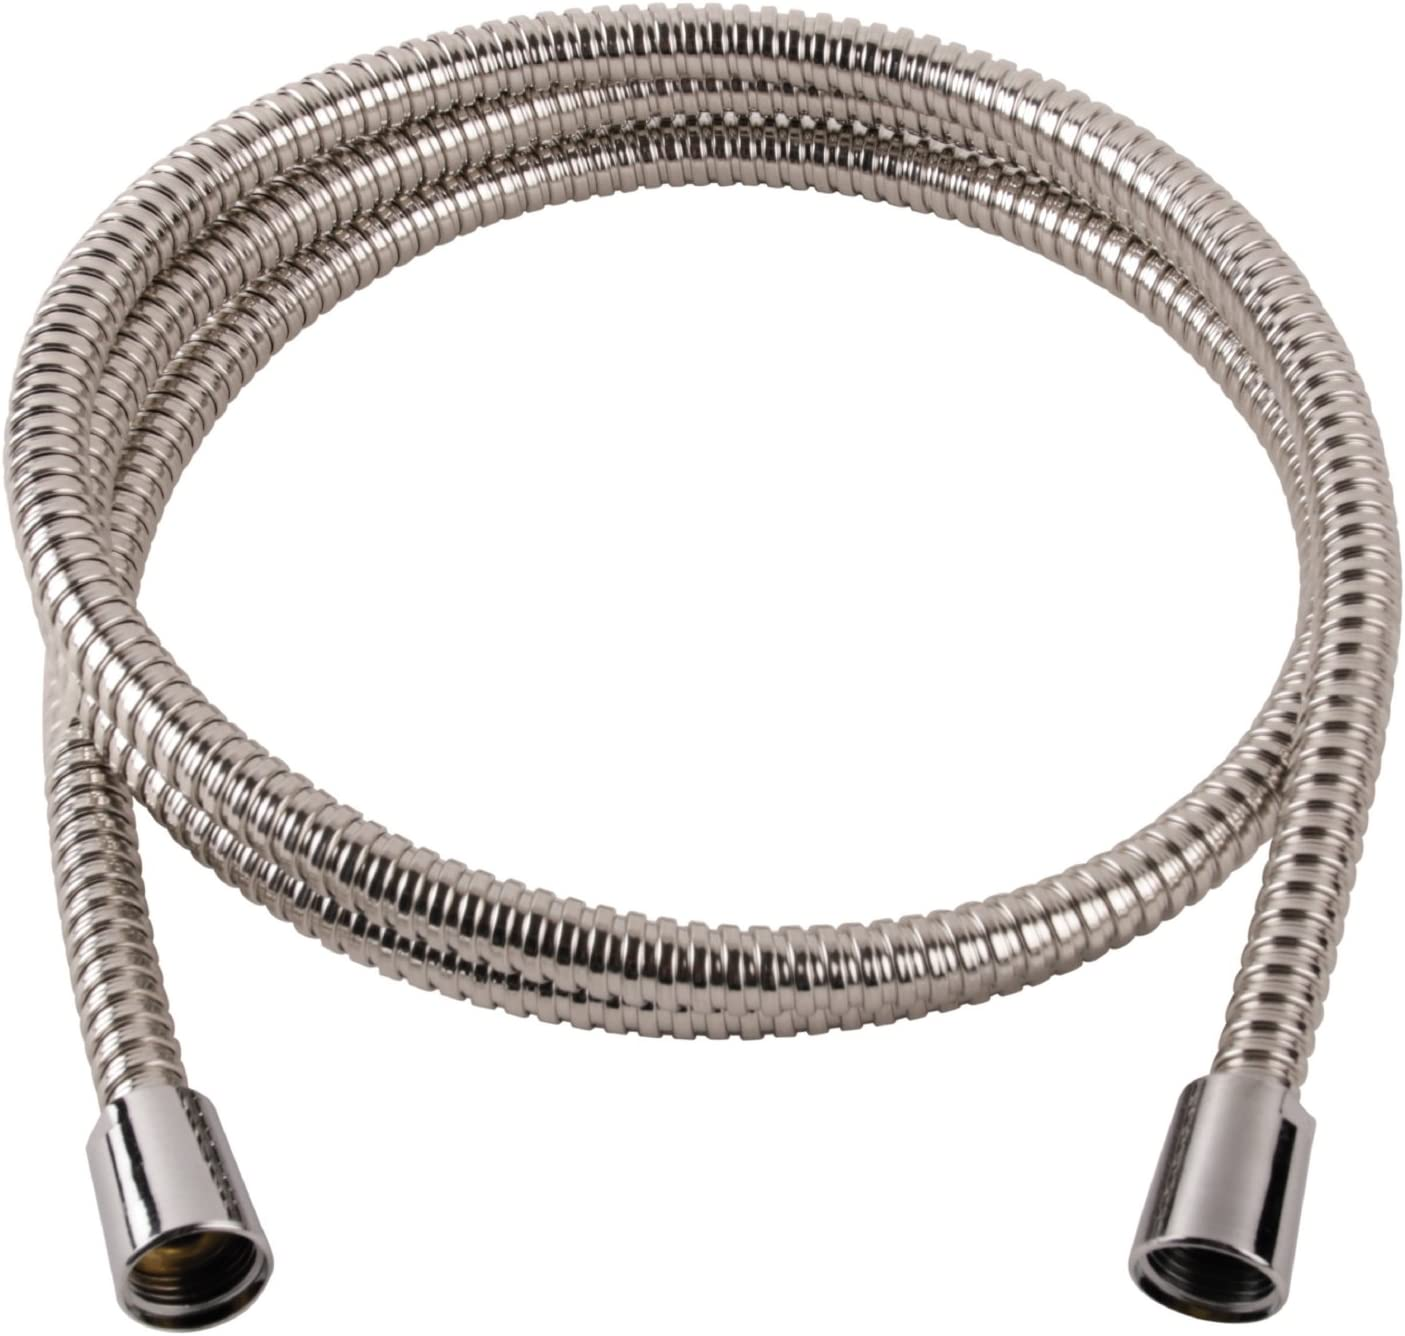 AquaSu flexible de douche chrome 2 72561 3 m